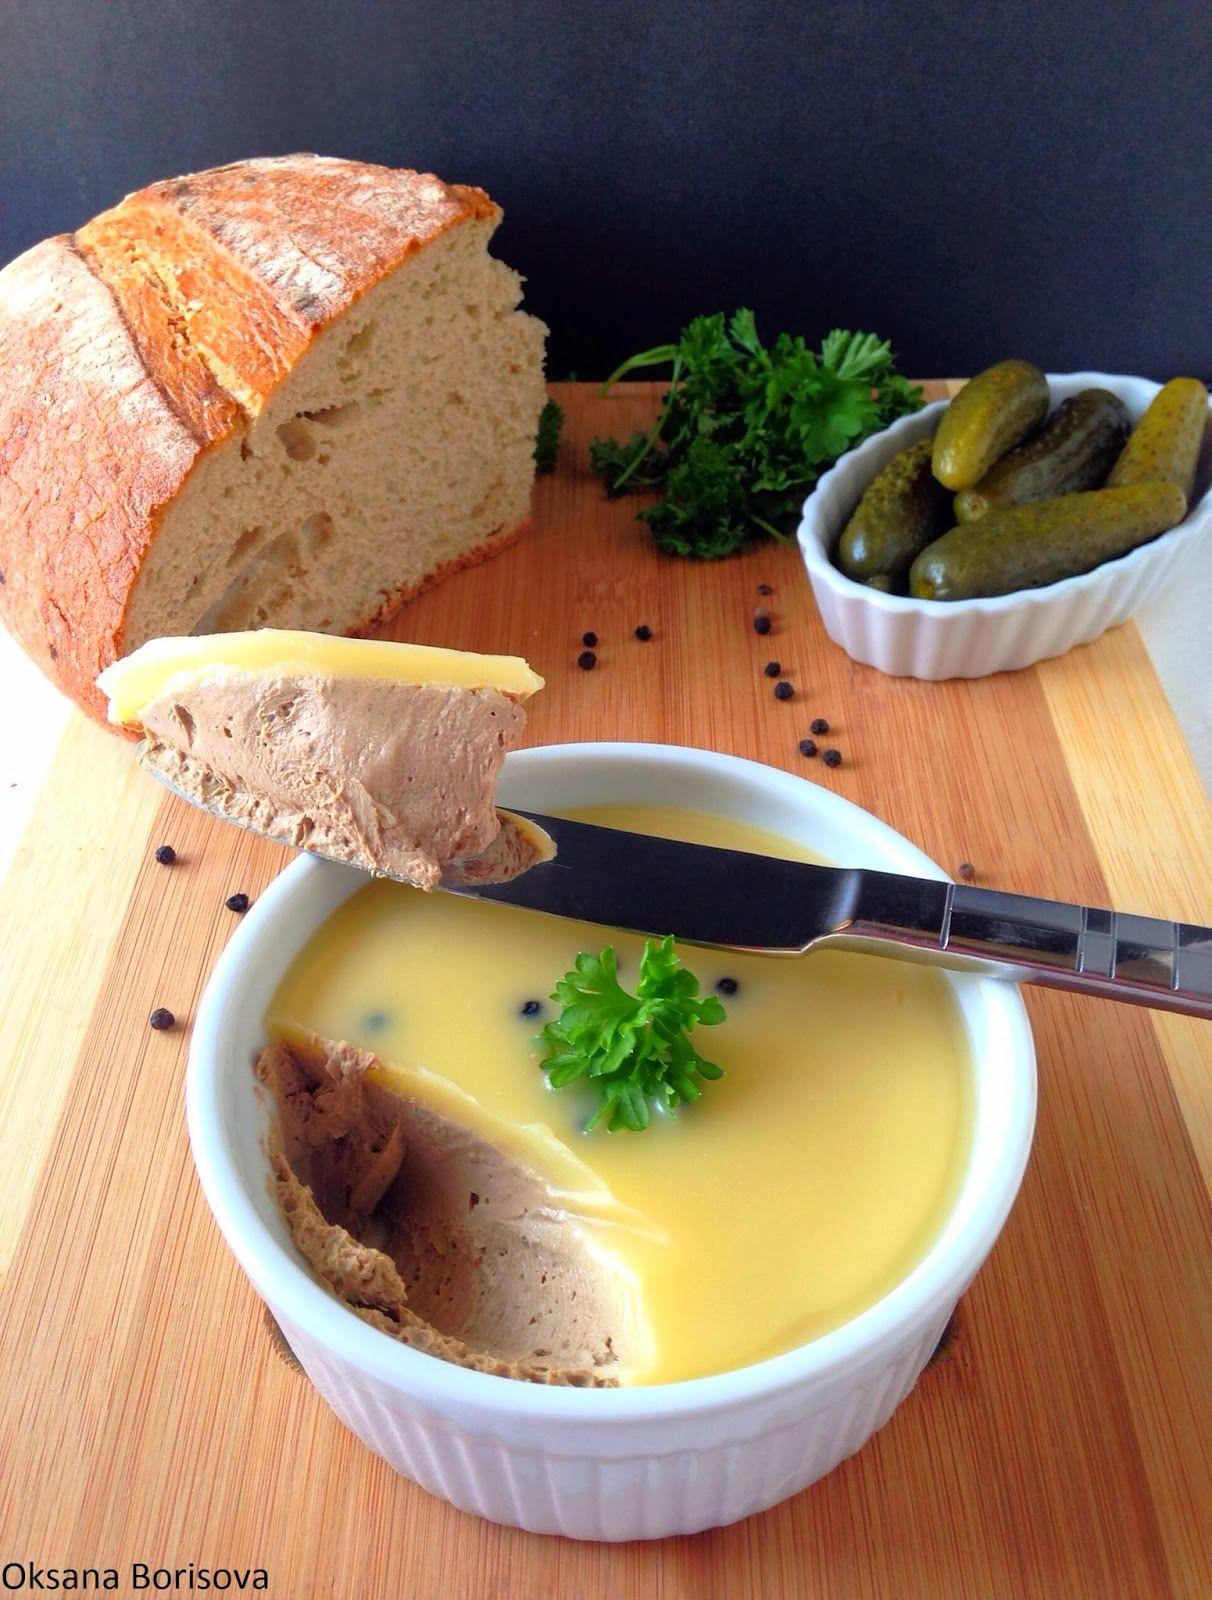 Kulinarnye Momenty Kurinyj Pashtet Rezepte Kochrezepte Ideen Furs Essen